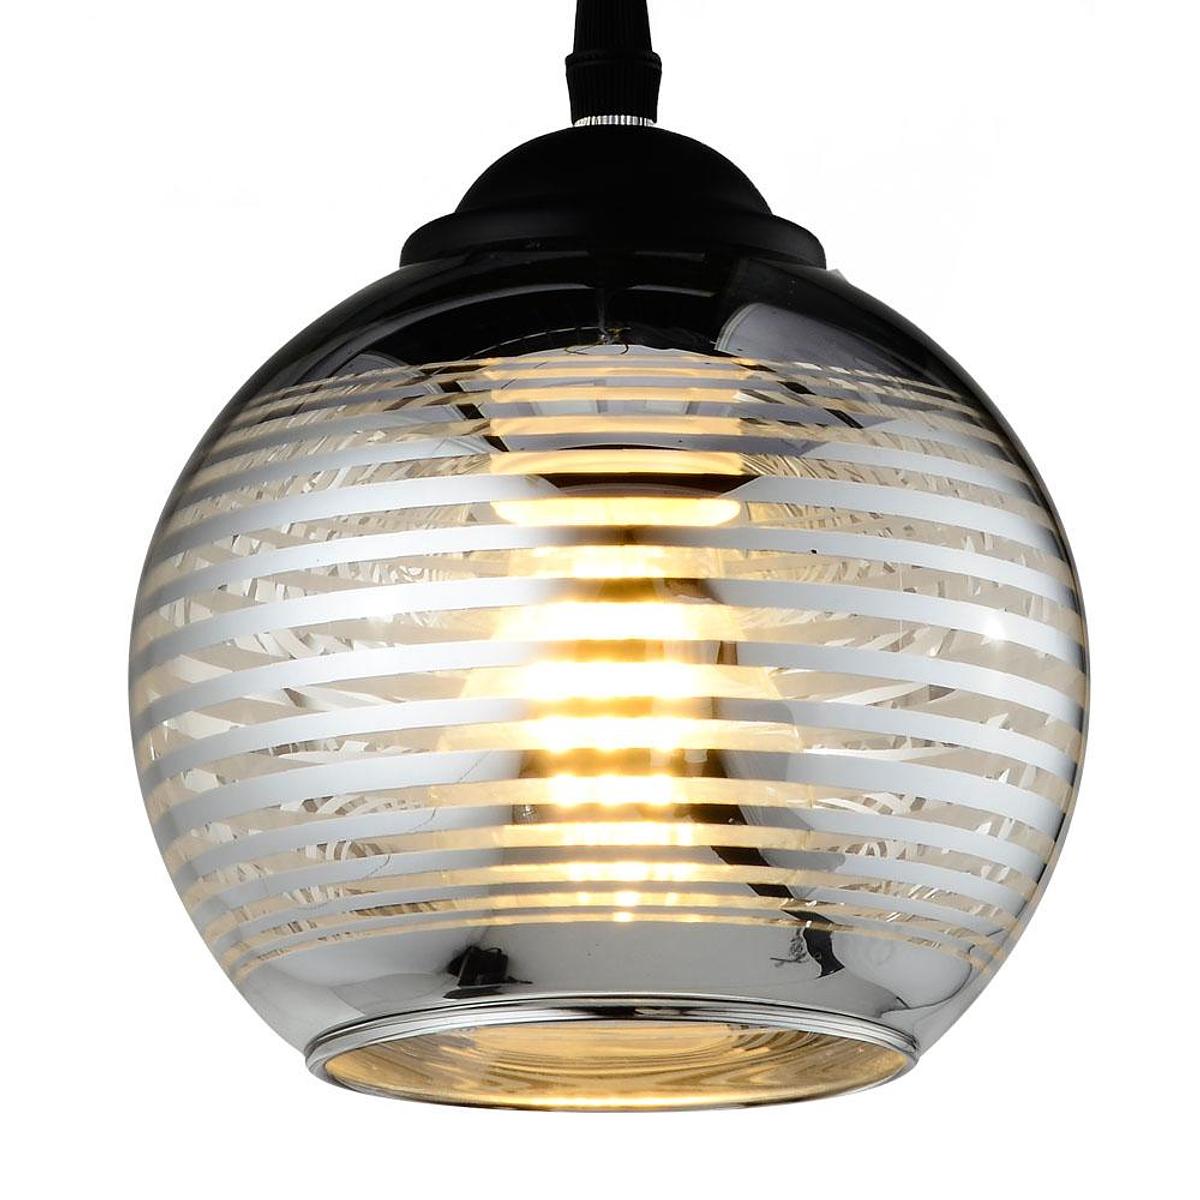 Iluminaci n decorativa - Iluminacion led decorativa ...